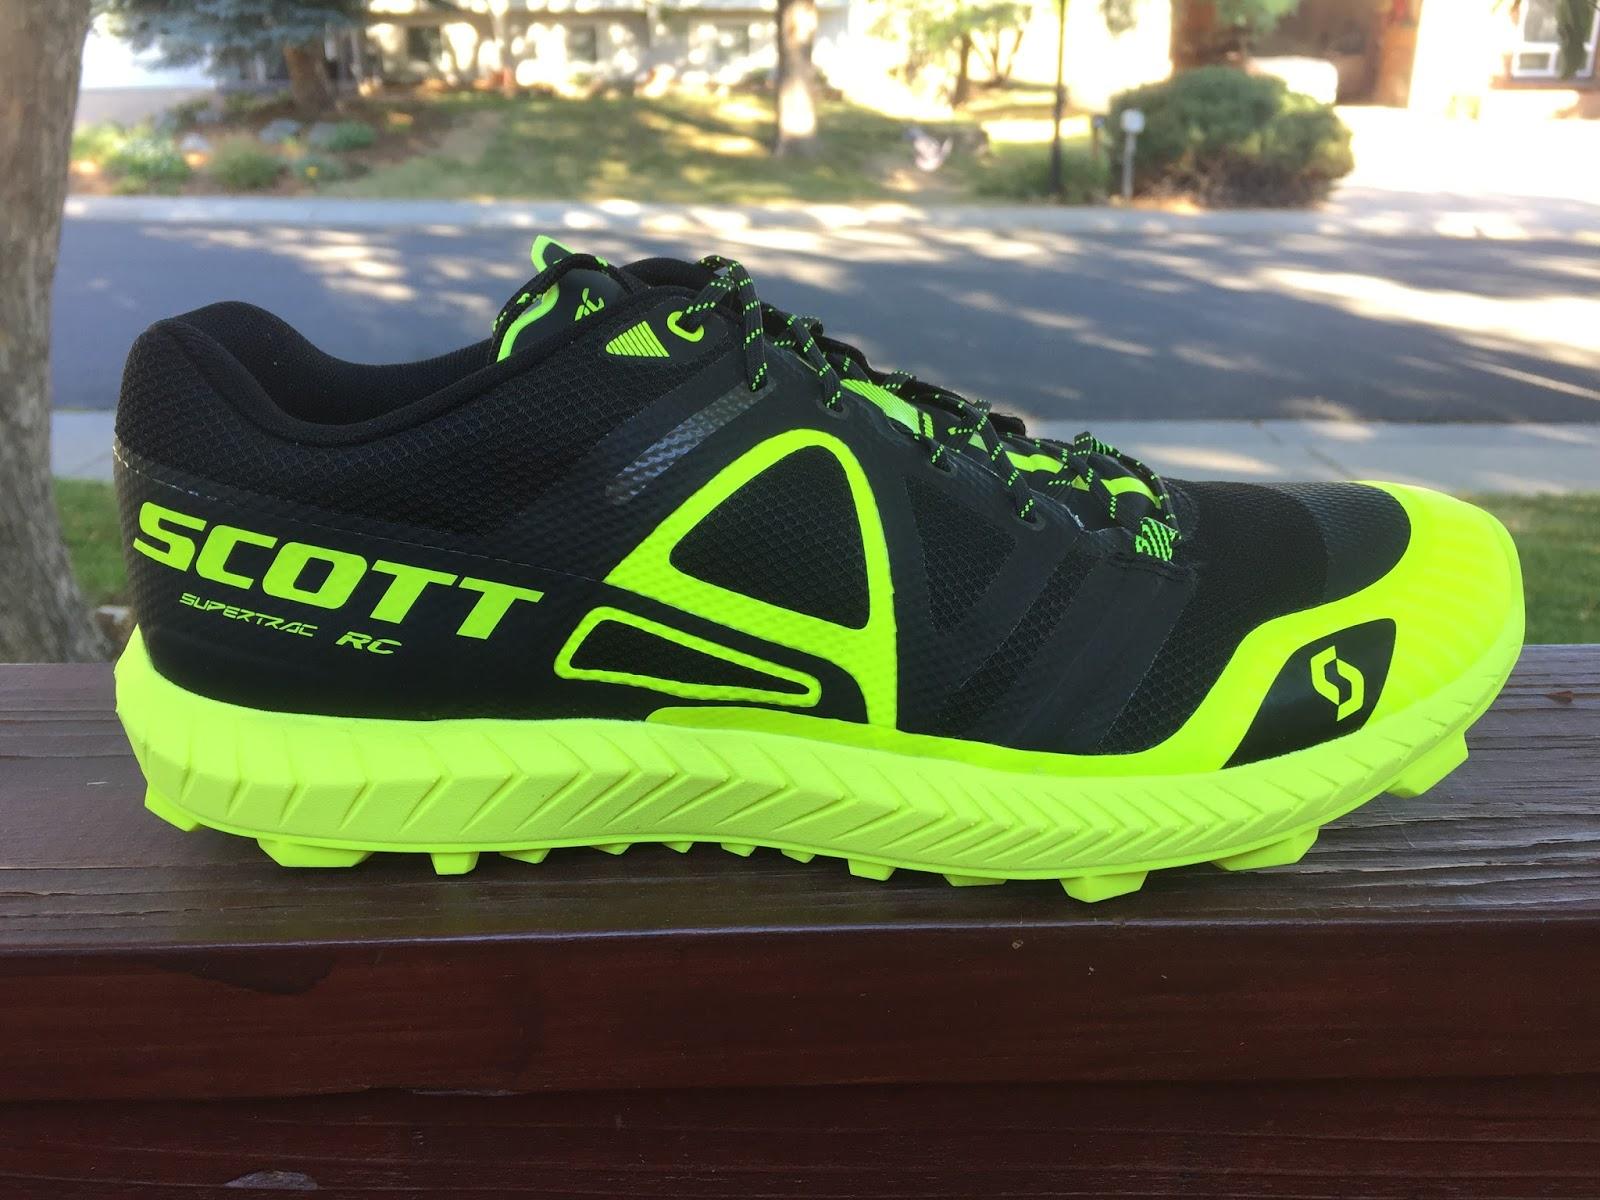 fe4f7cb621f Road Trail Run  Scott Supertrac RC - A Top Tier